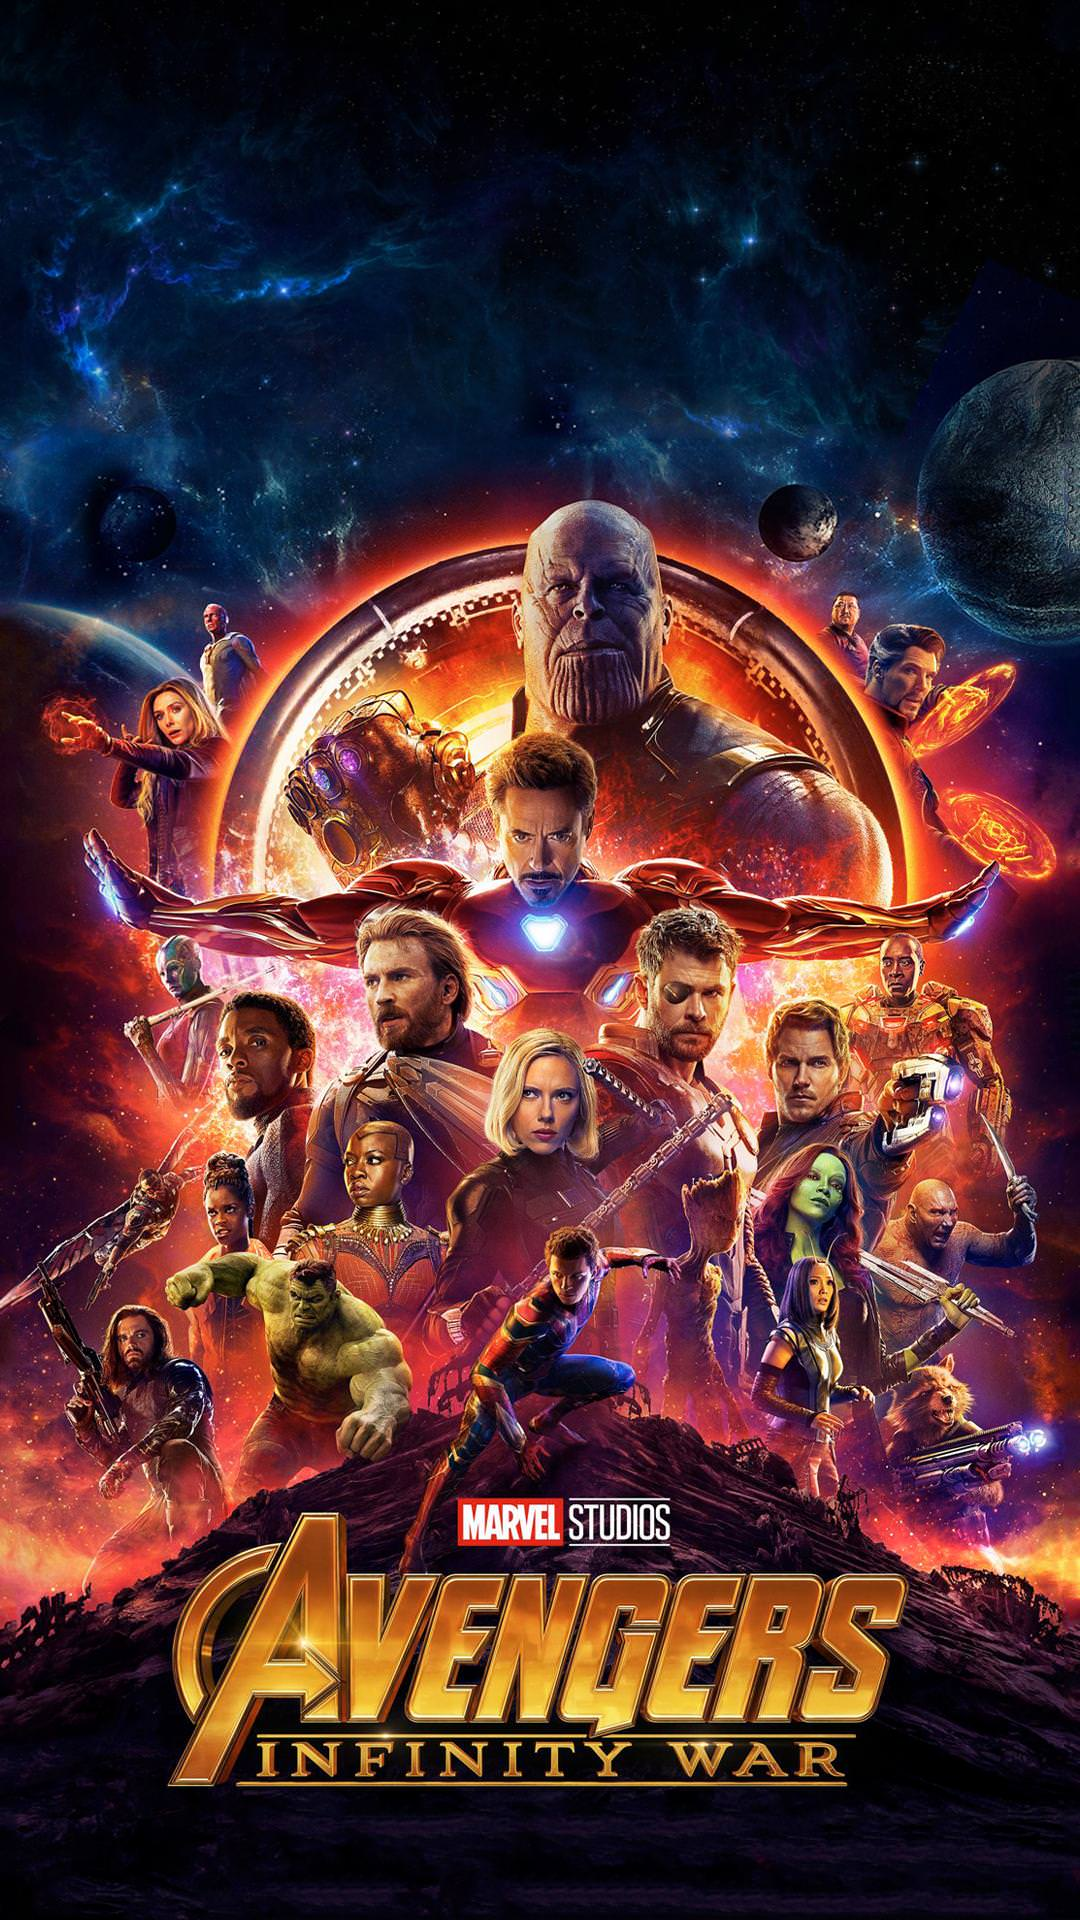 Avengers Endgame Wallpaper Hd Captain America Gaphotoworks Free